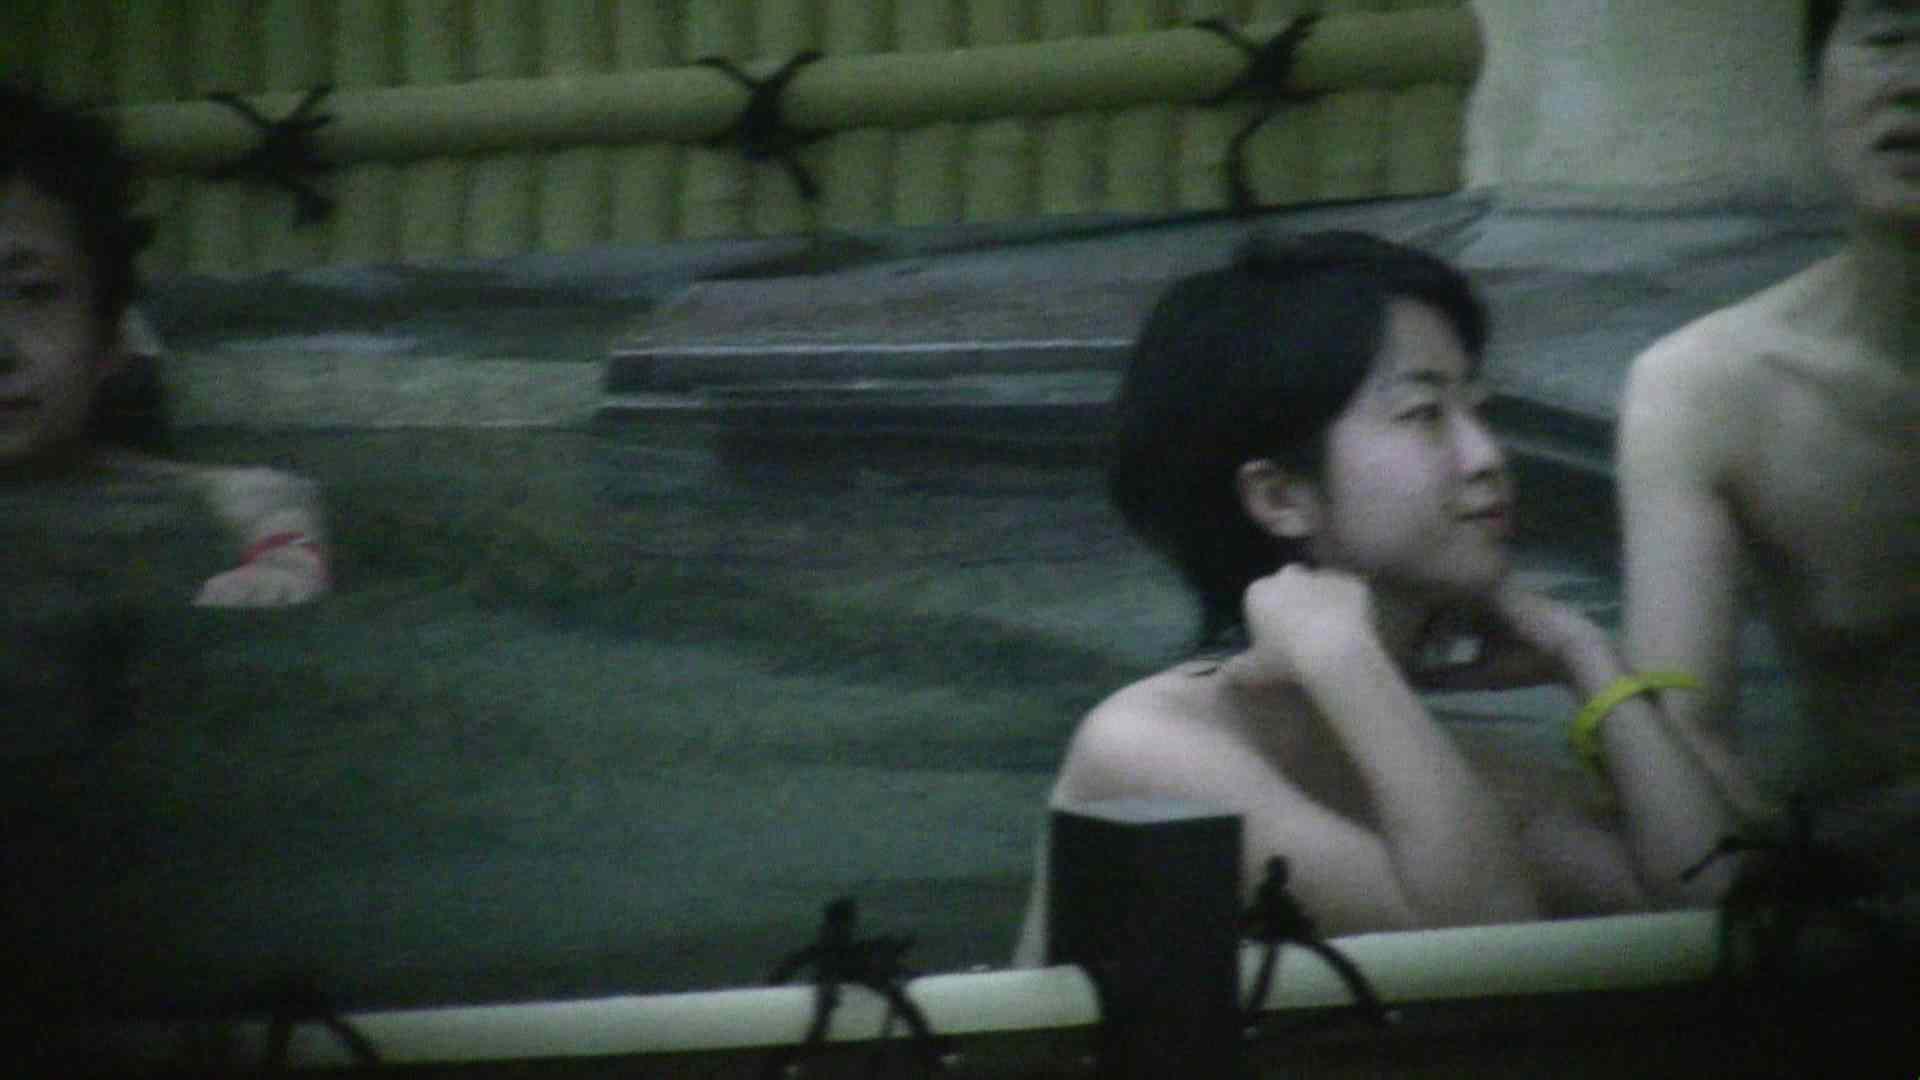 Aquaな露天風呂Vol.112 0 | 0  68連発 39